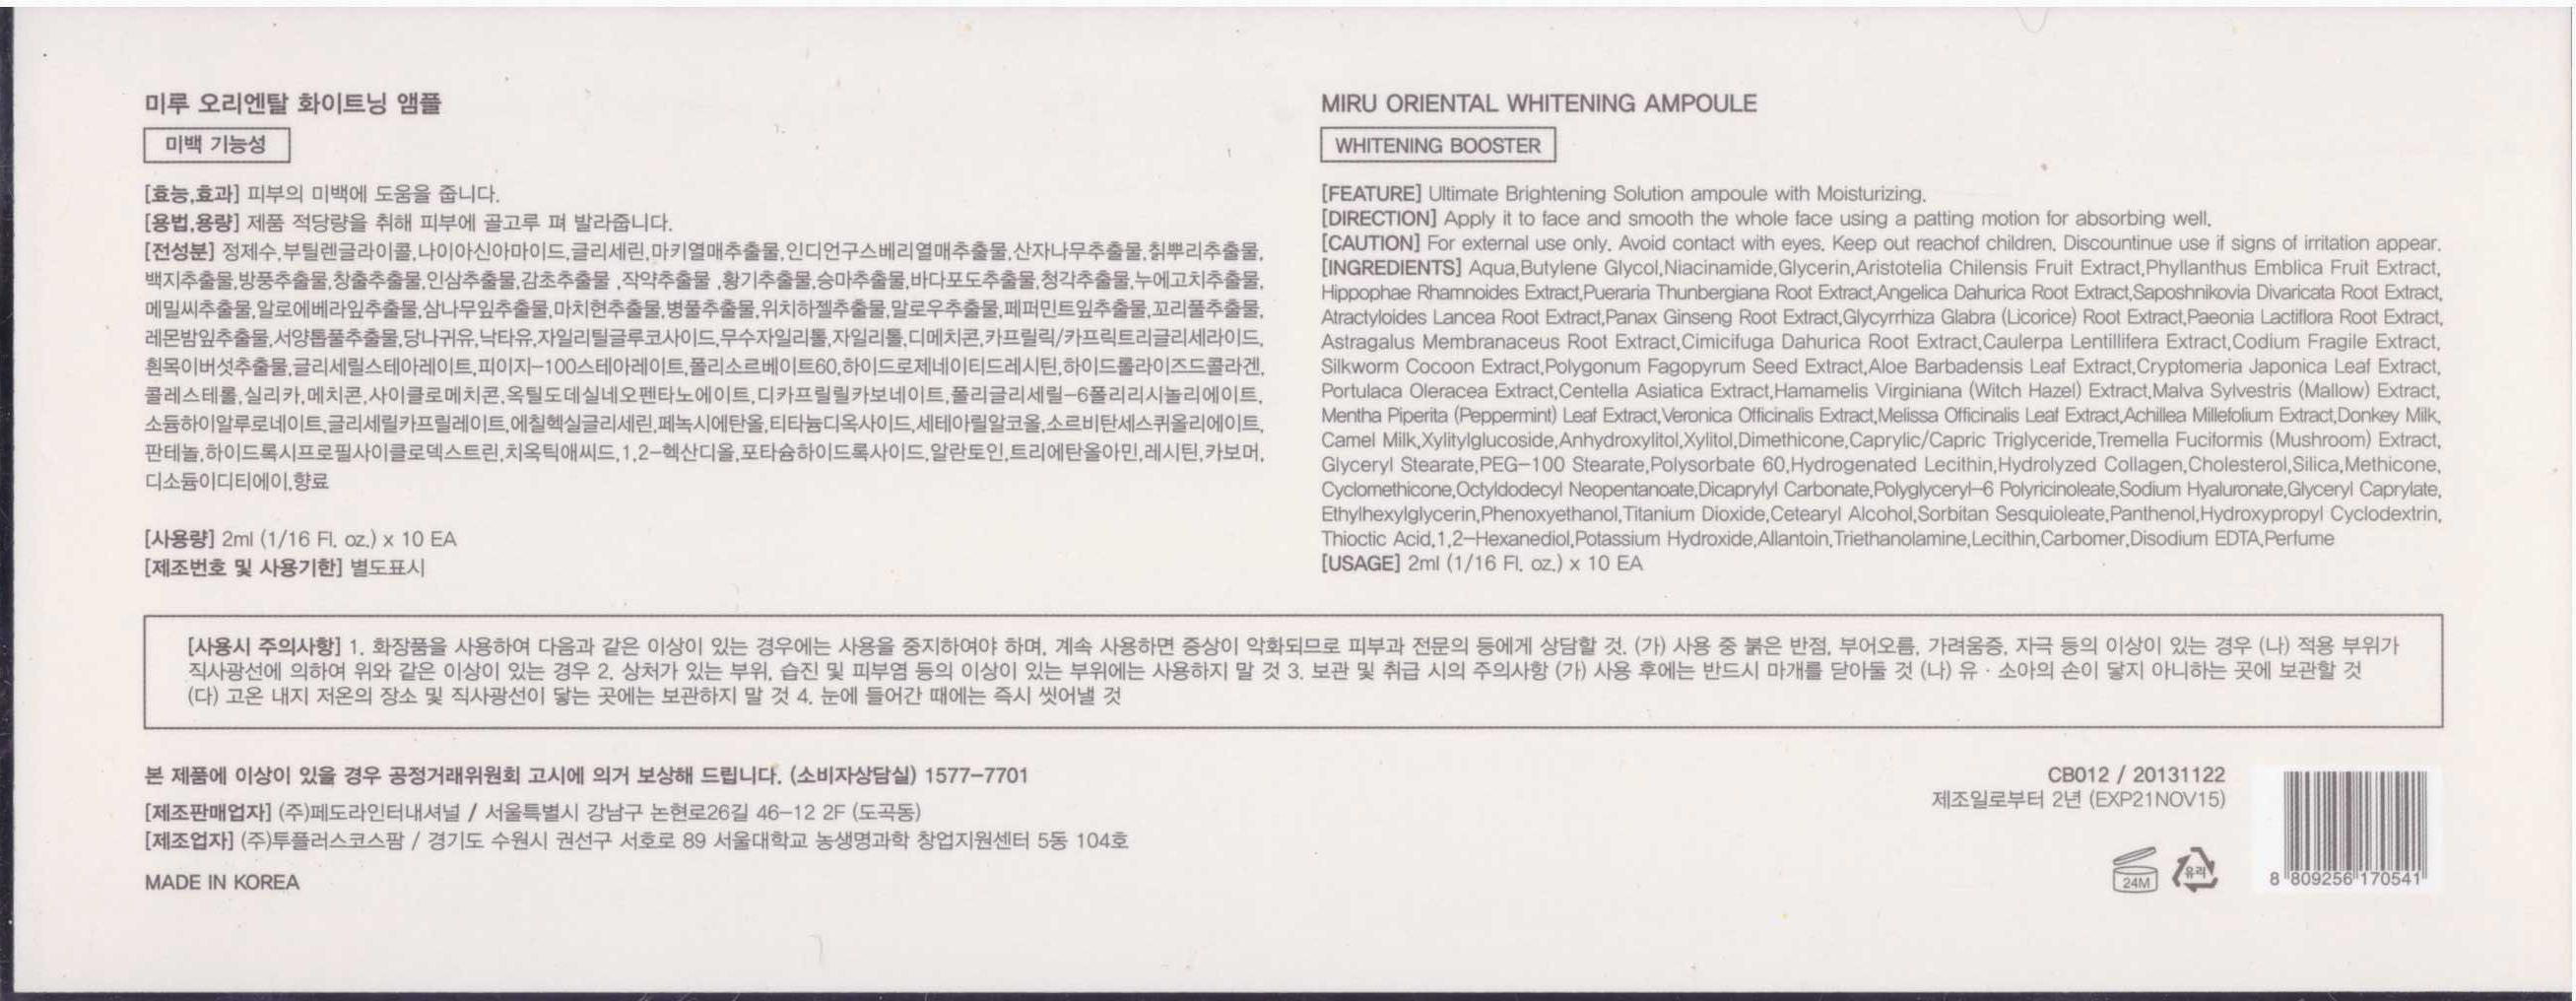 Miru Oriental Whitening Ampoule (Glycerin) Liquid [Fedora International Co., Ltd.]